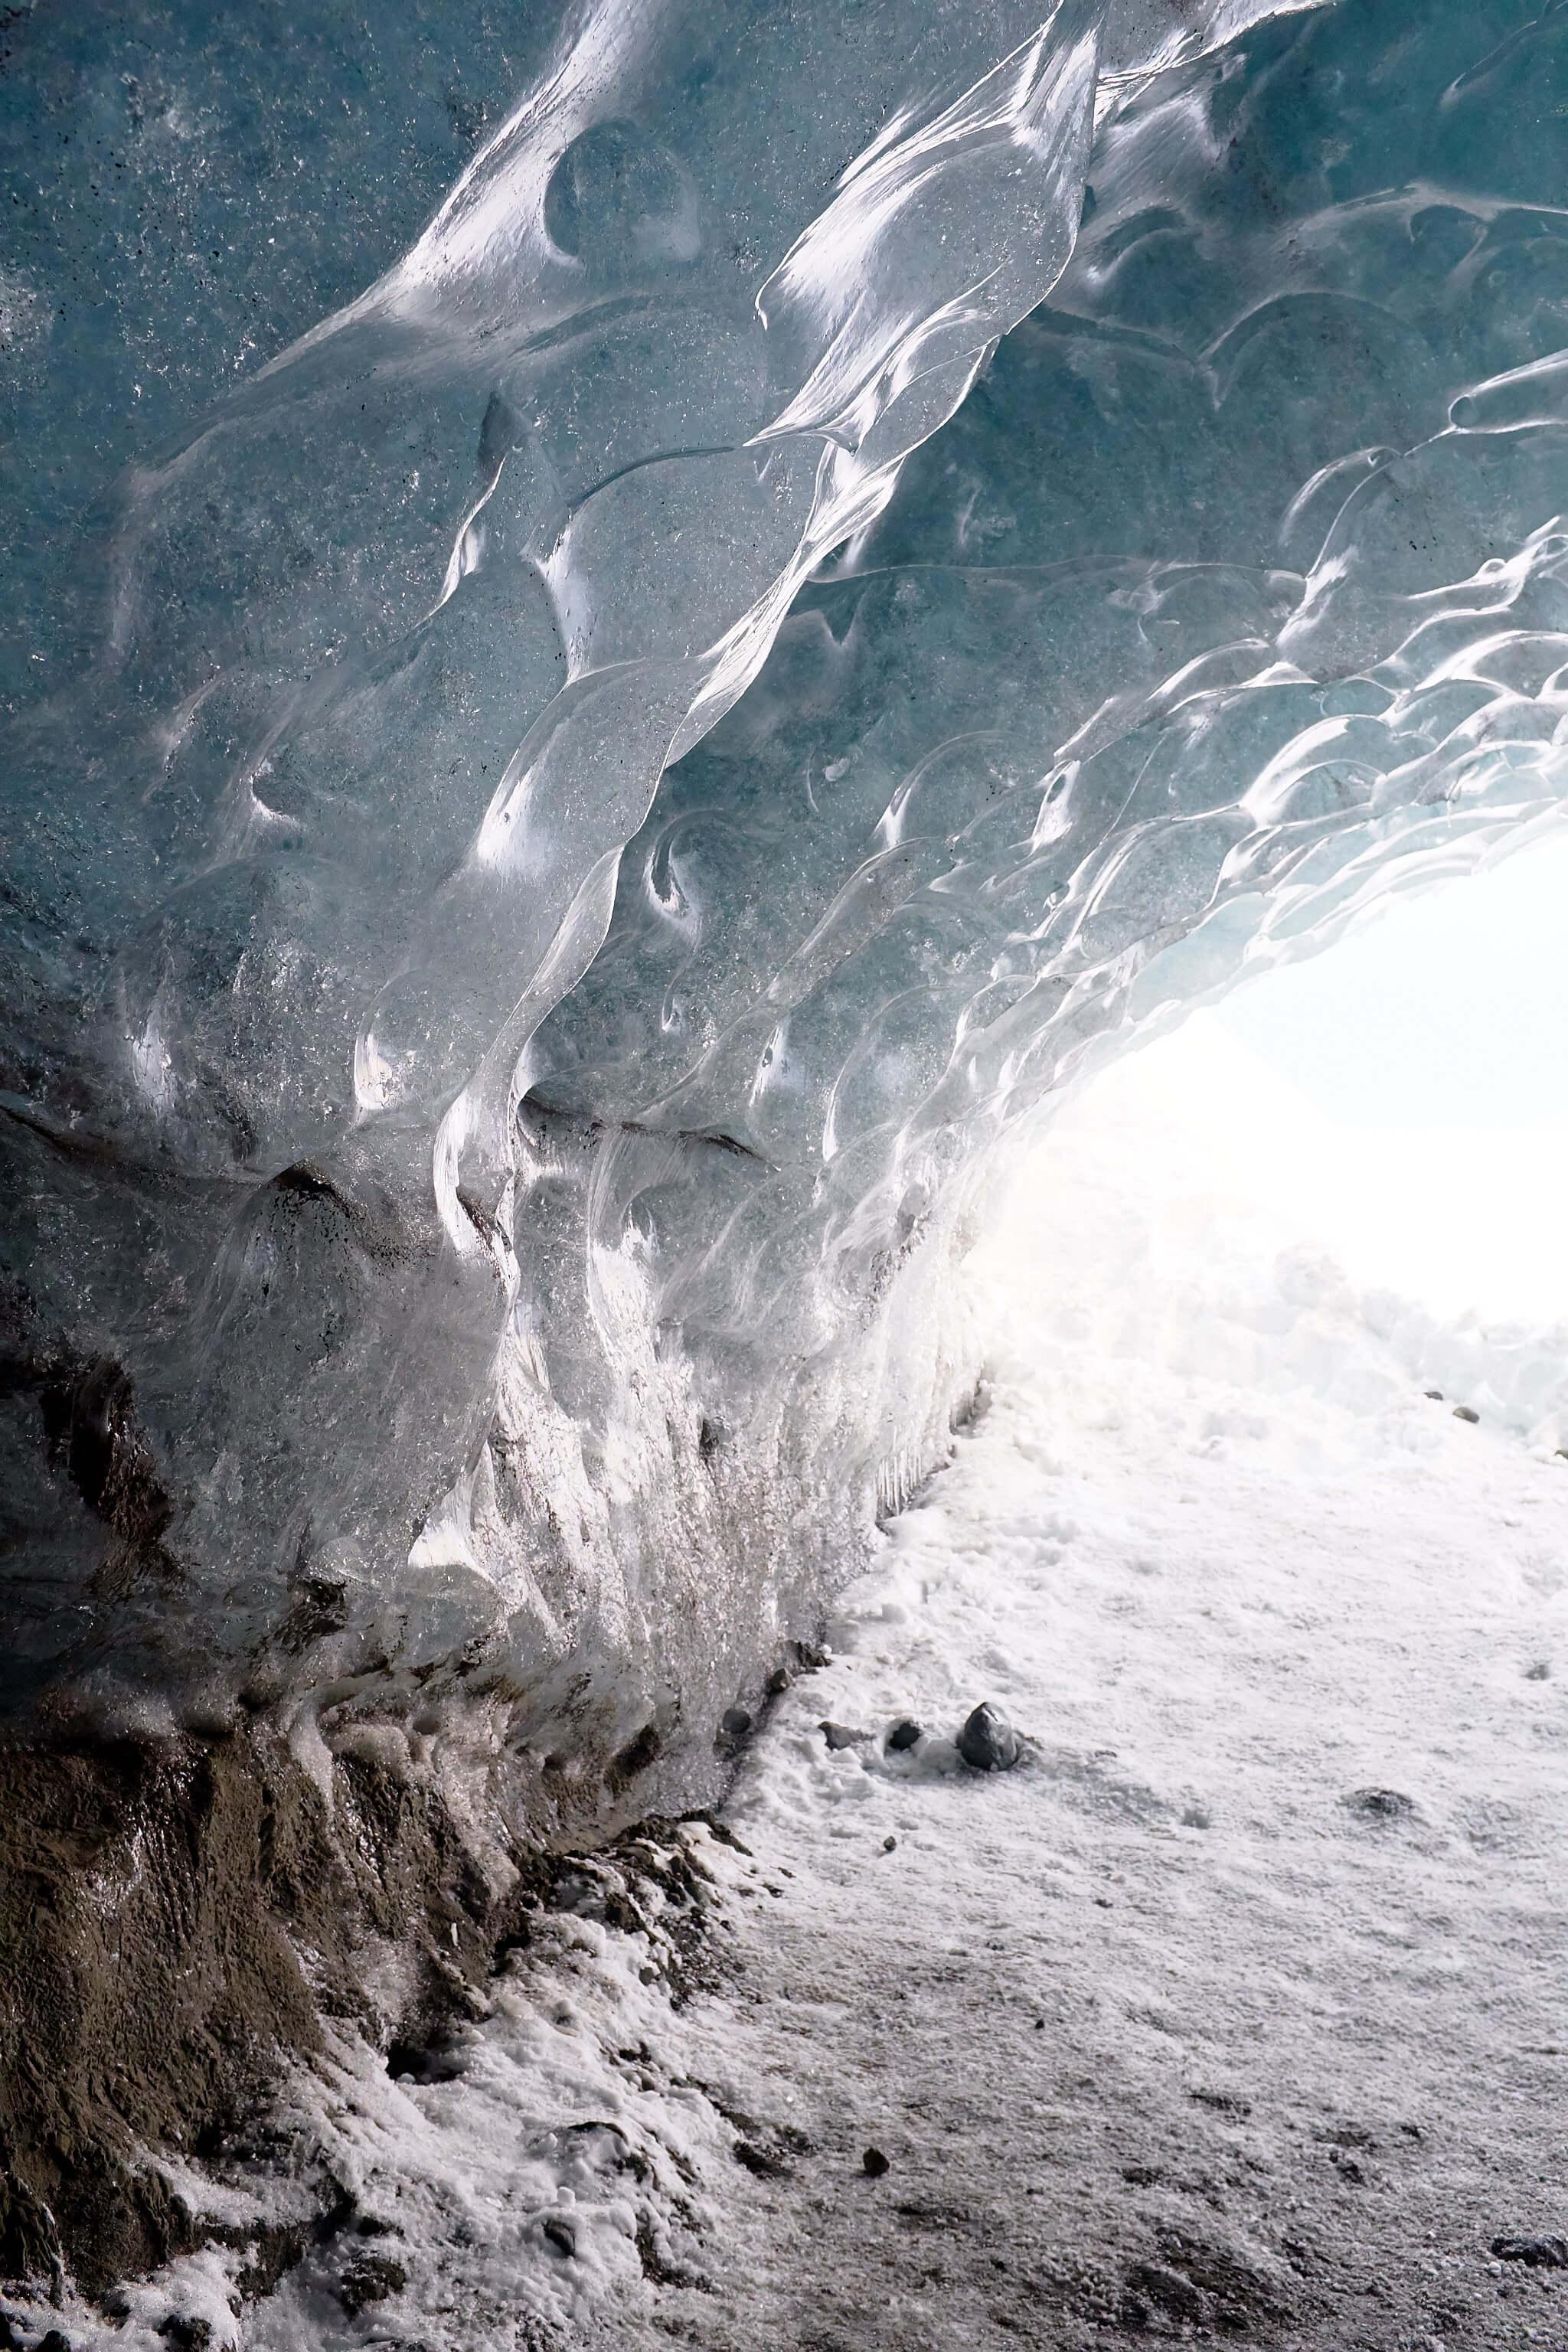 She's So Bright - Into the Ice Caves of Vatnajökull